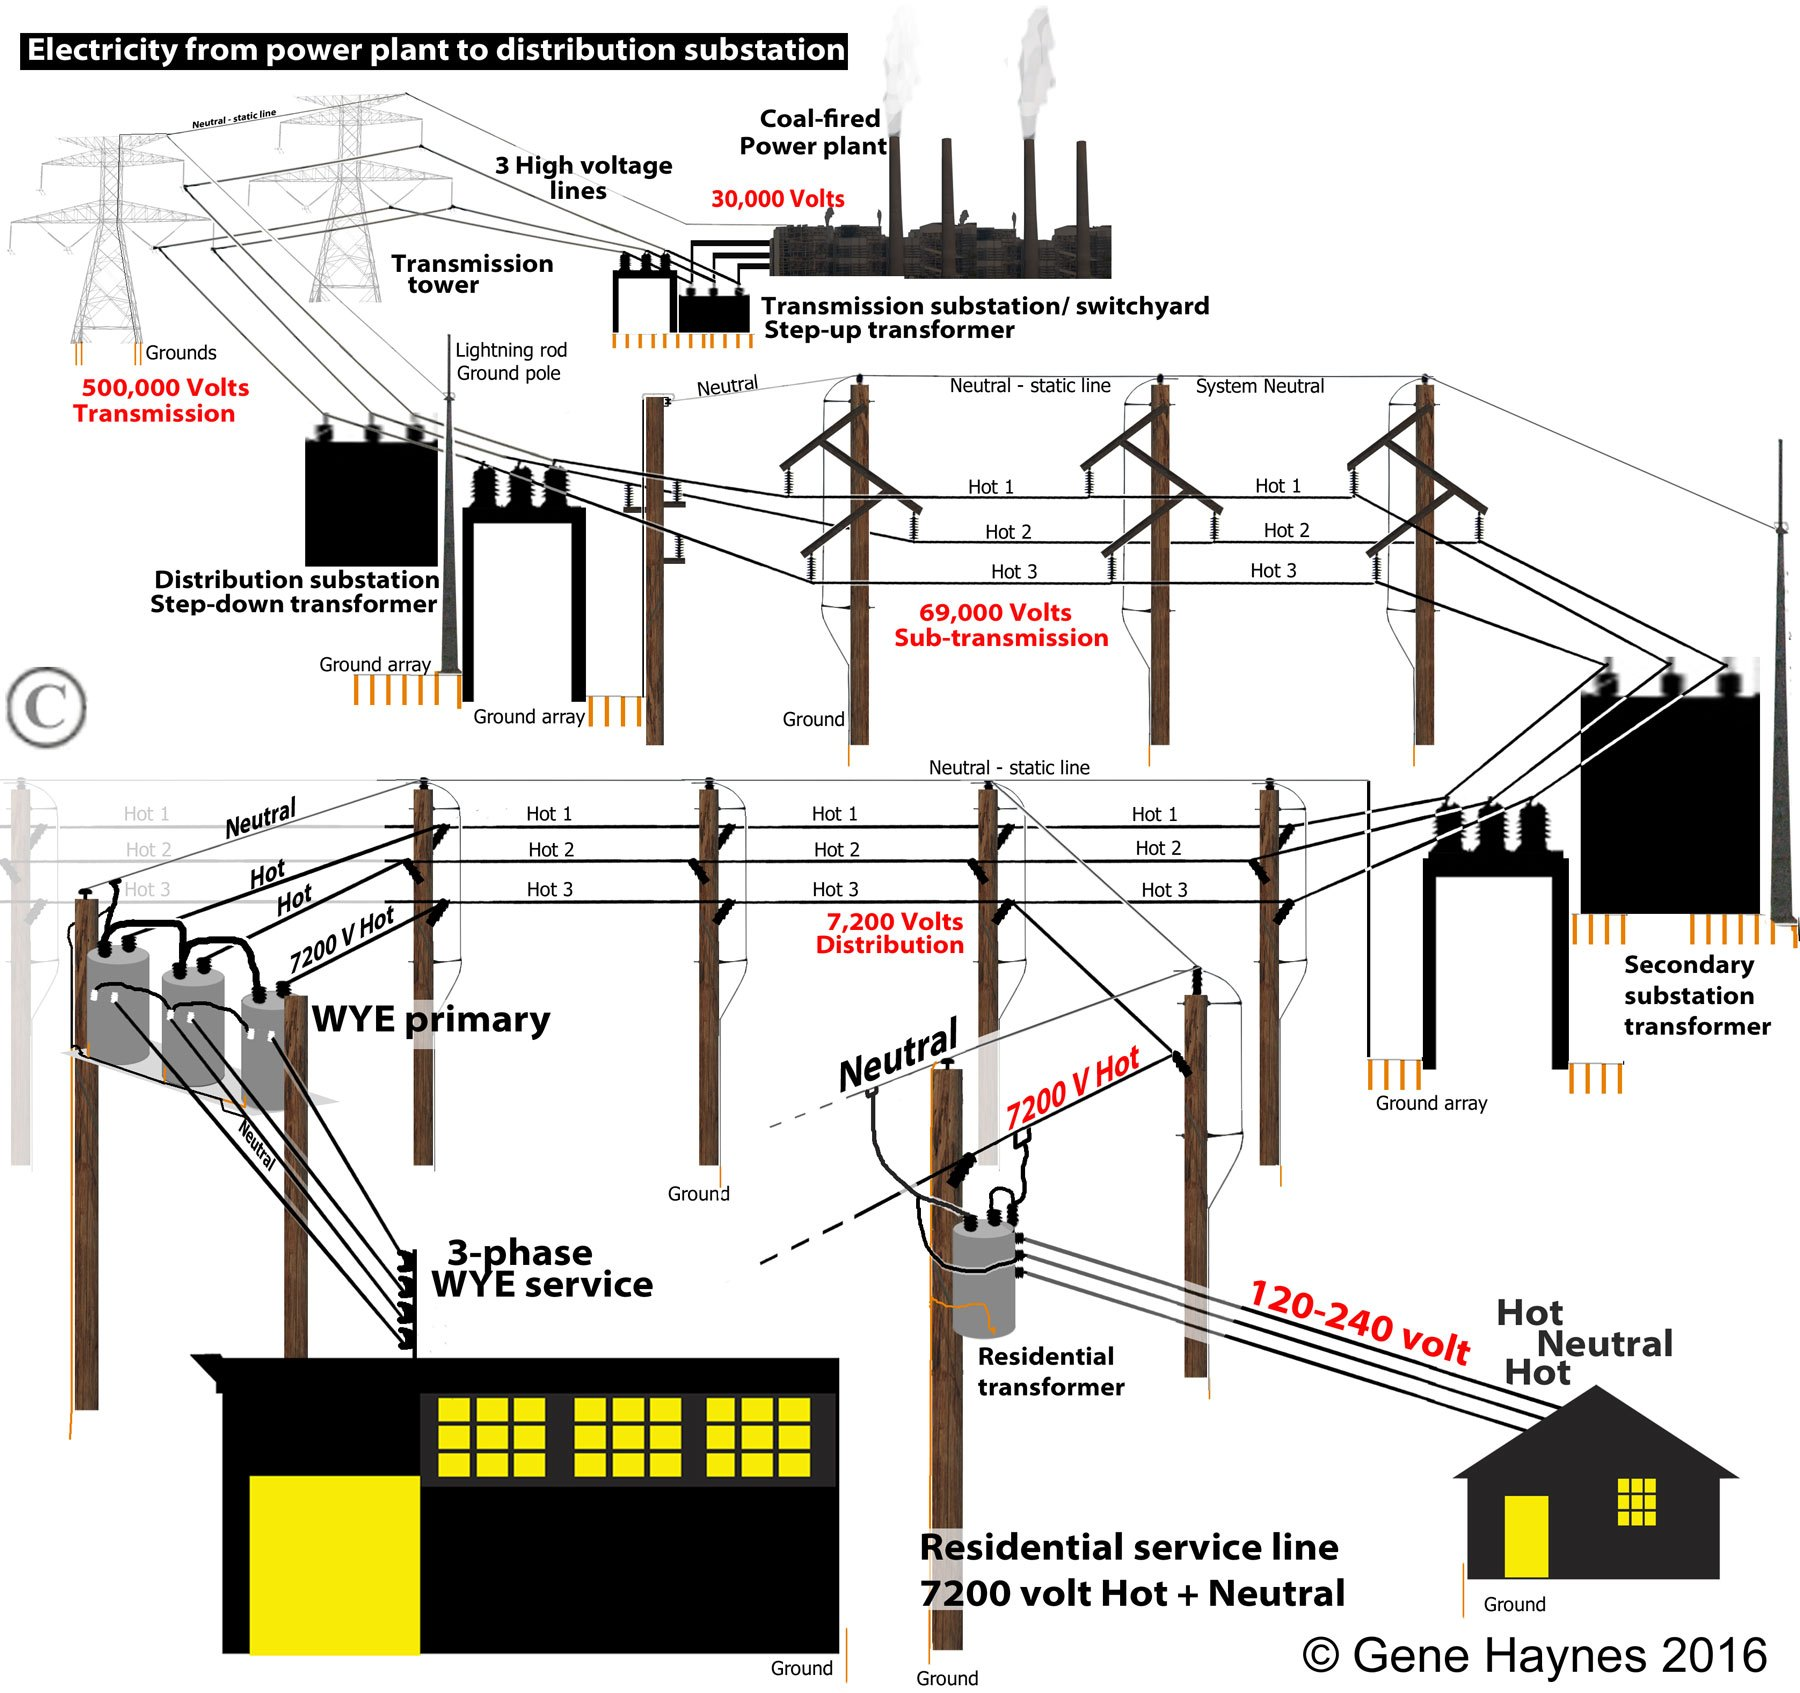 Strange 3 Phase Trash Compactor Wiring Diagram Wiring Diagram Wiring Cloud Overrenstrafr09Org